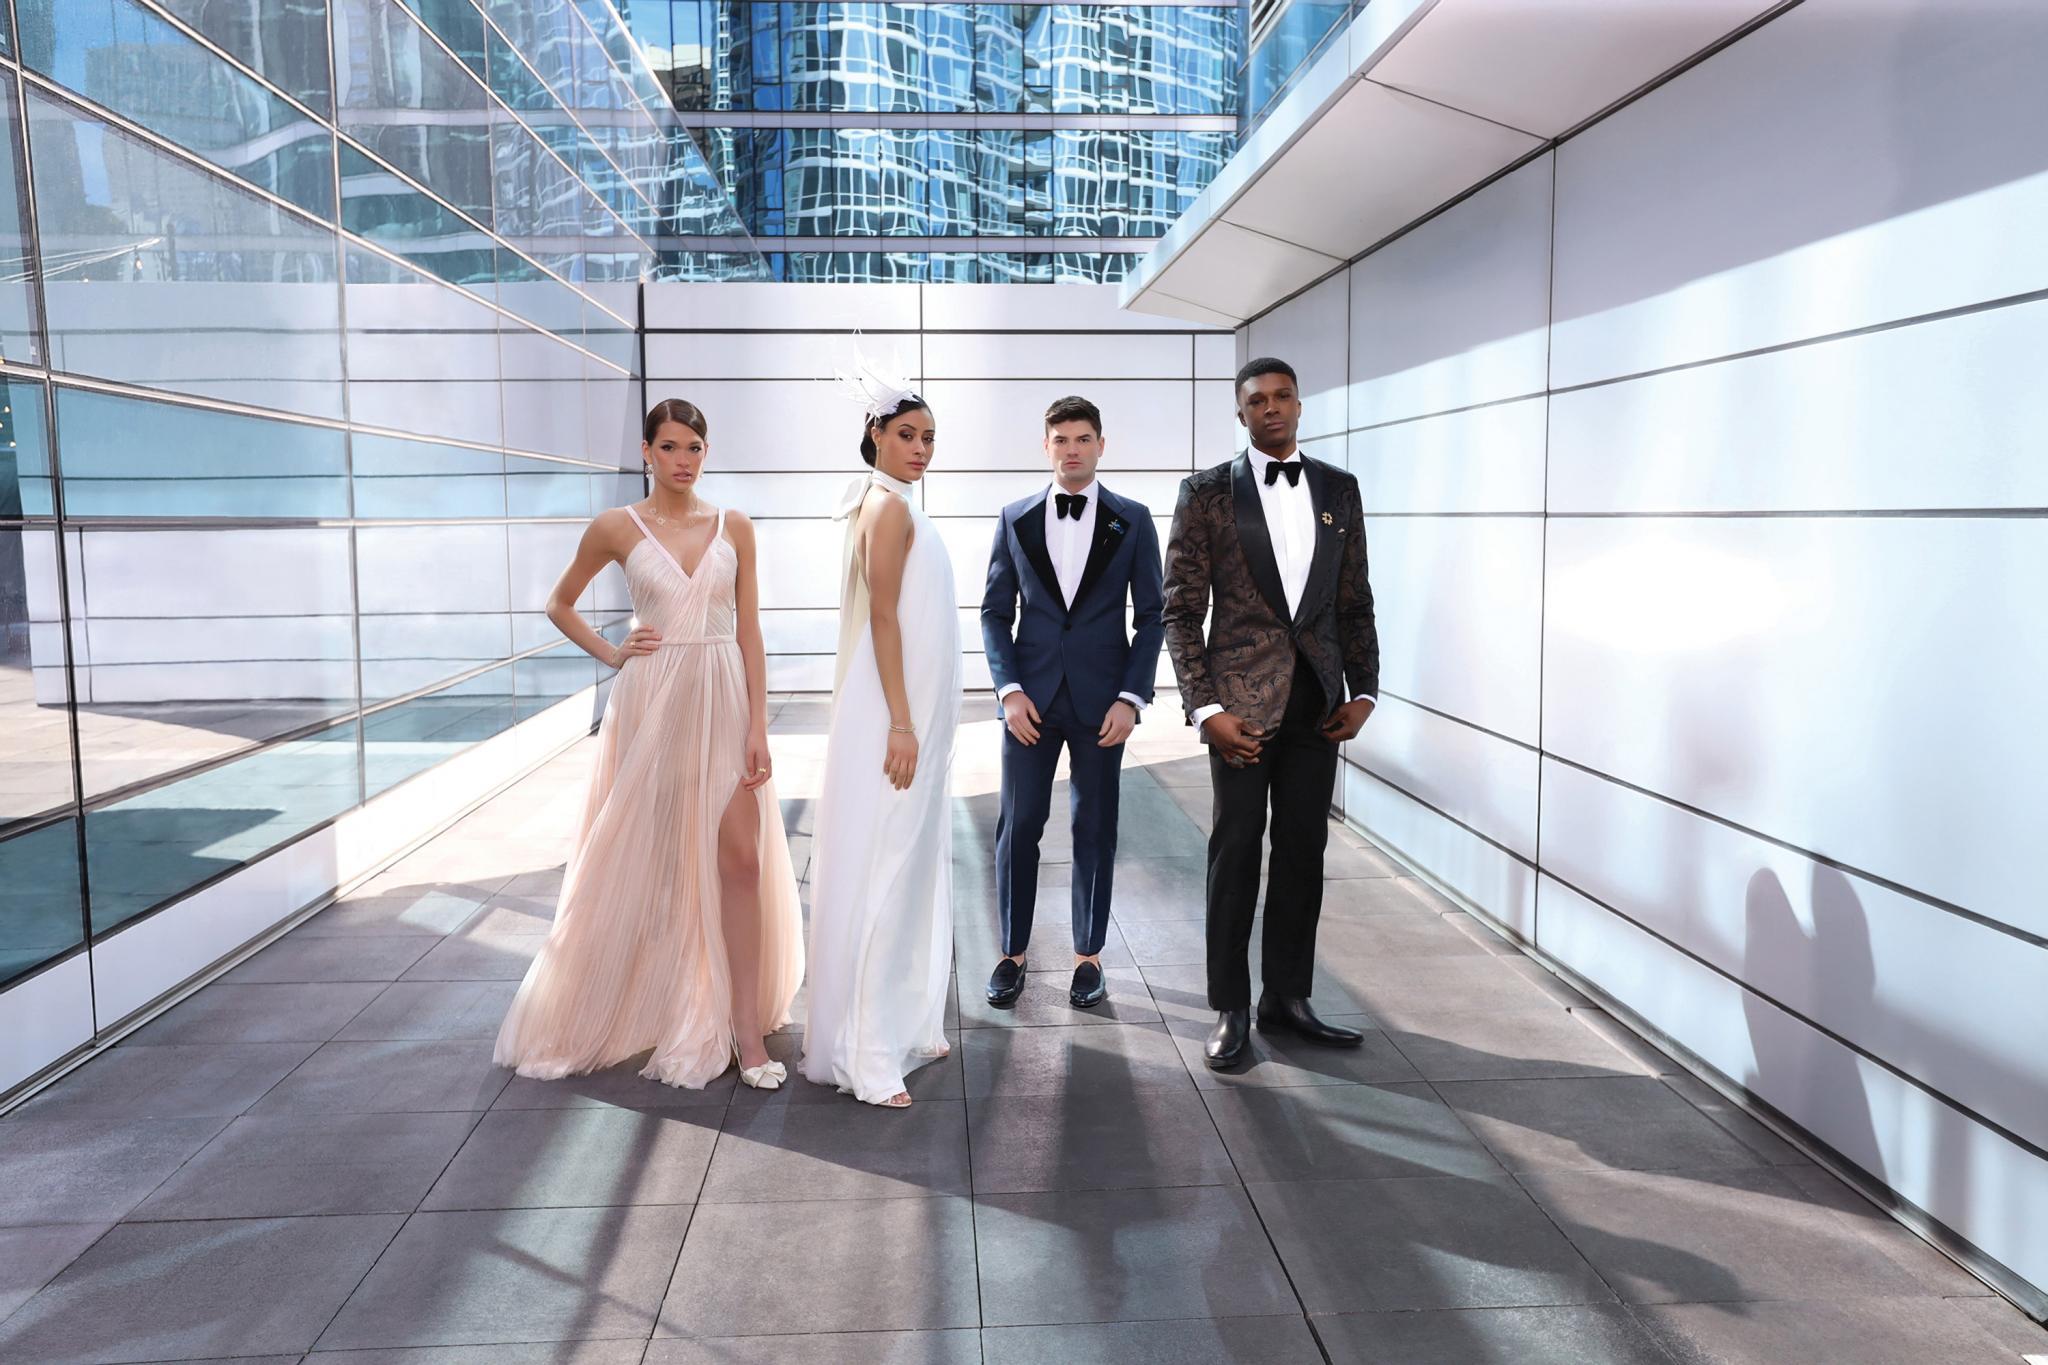 Haute in the City | Bridal Fashion Shoot | Bridal Fashion | Menswear | Wedding Party Attendants | Chicago Fashion Shoot